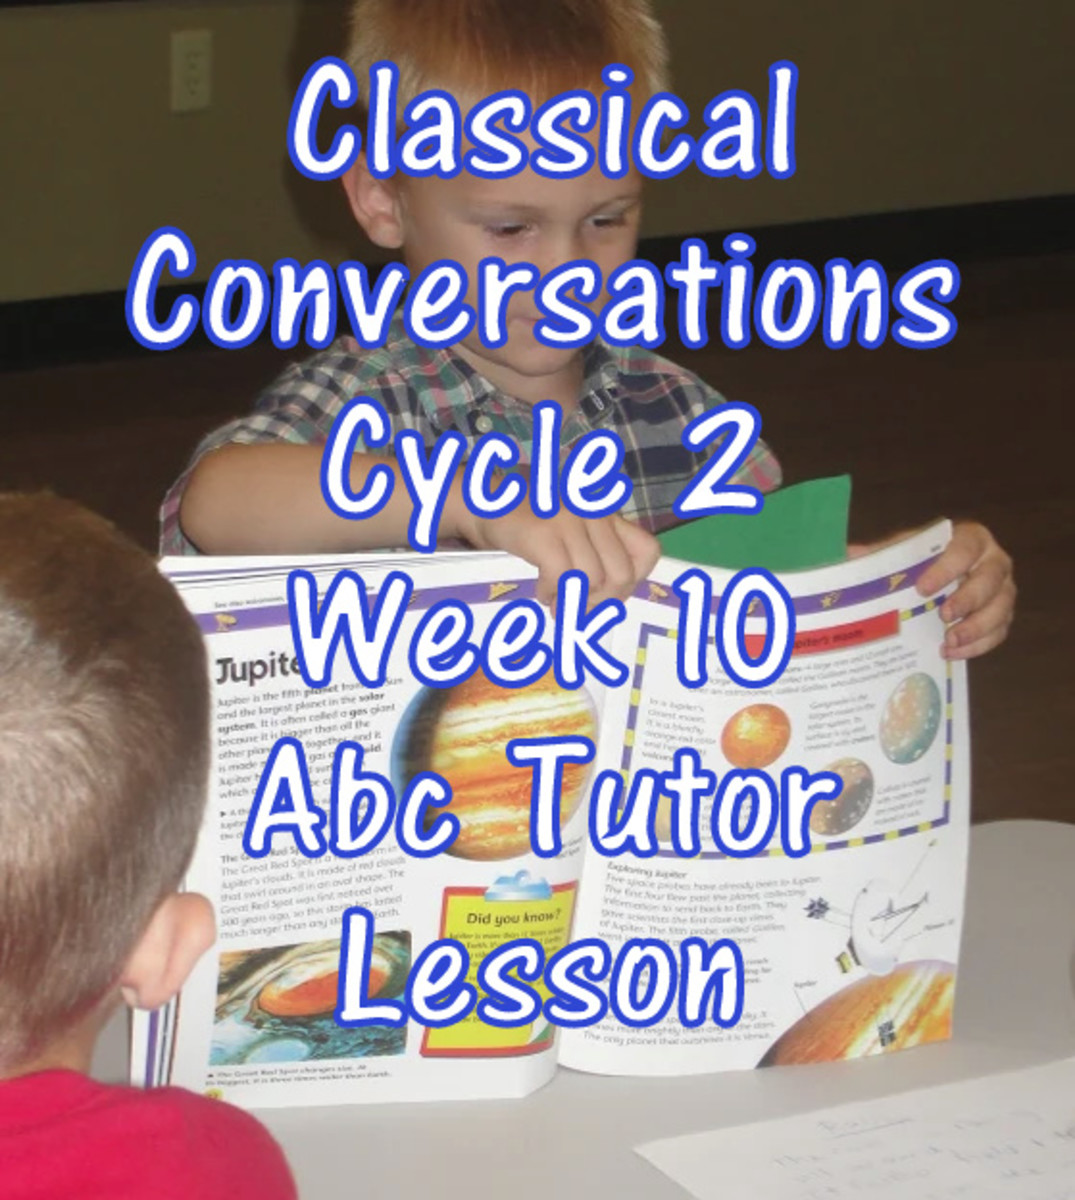 CC Cycle 2 Week 10 Lesson for Abecedarian Tutors